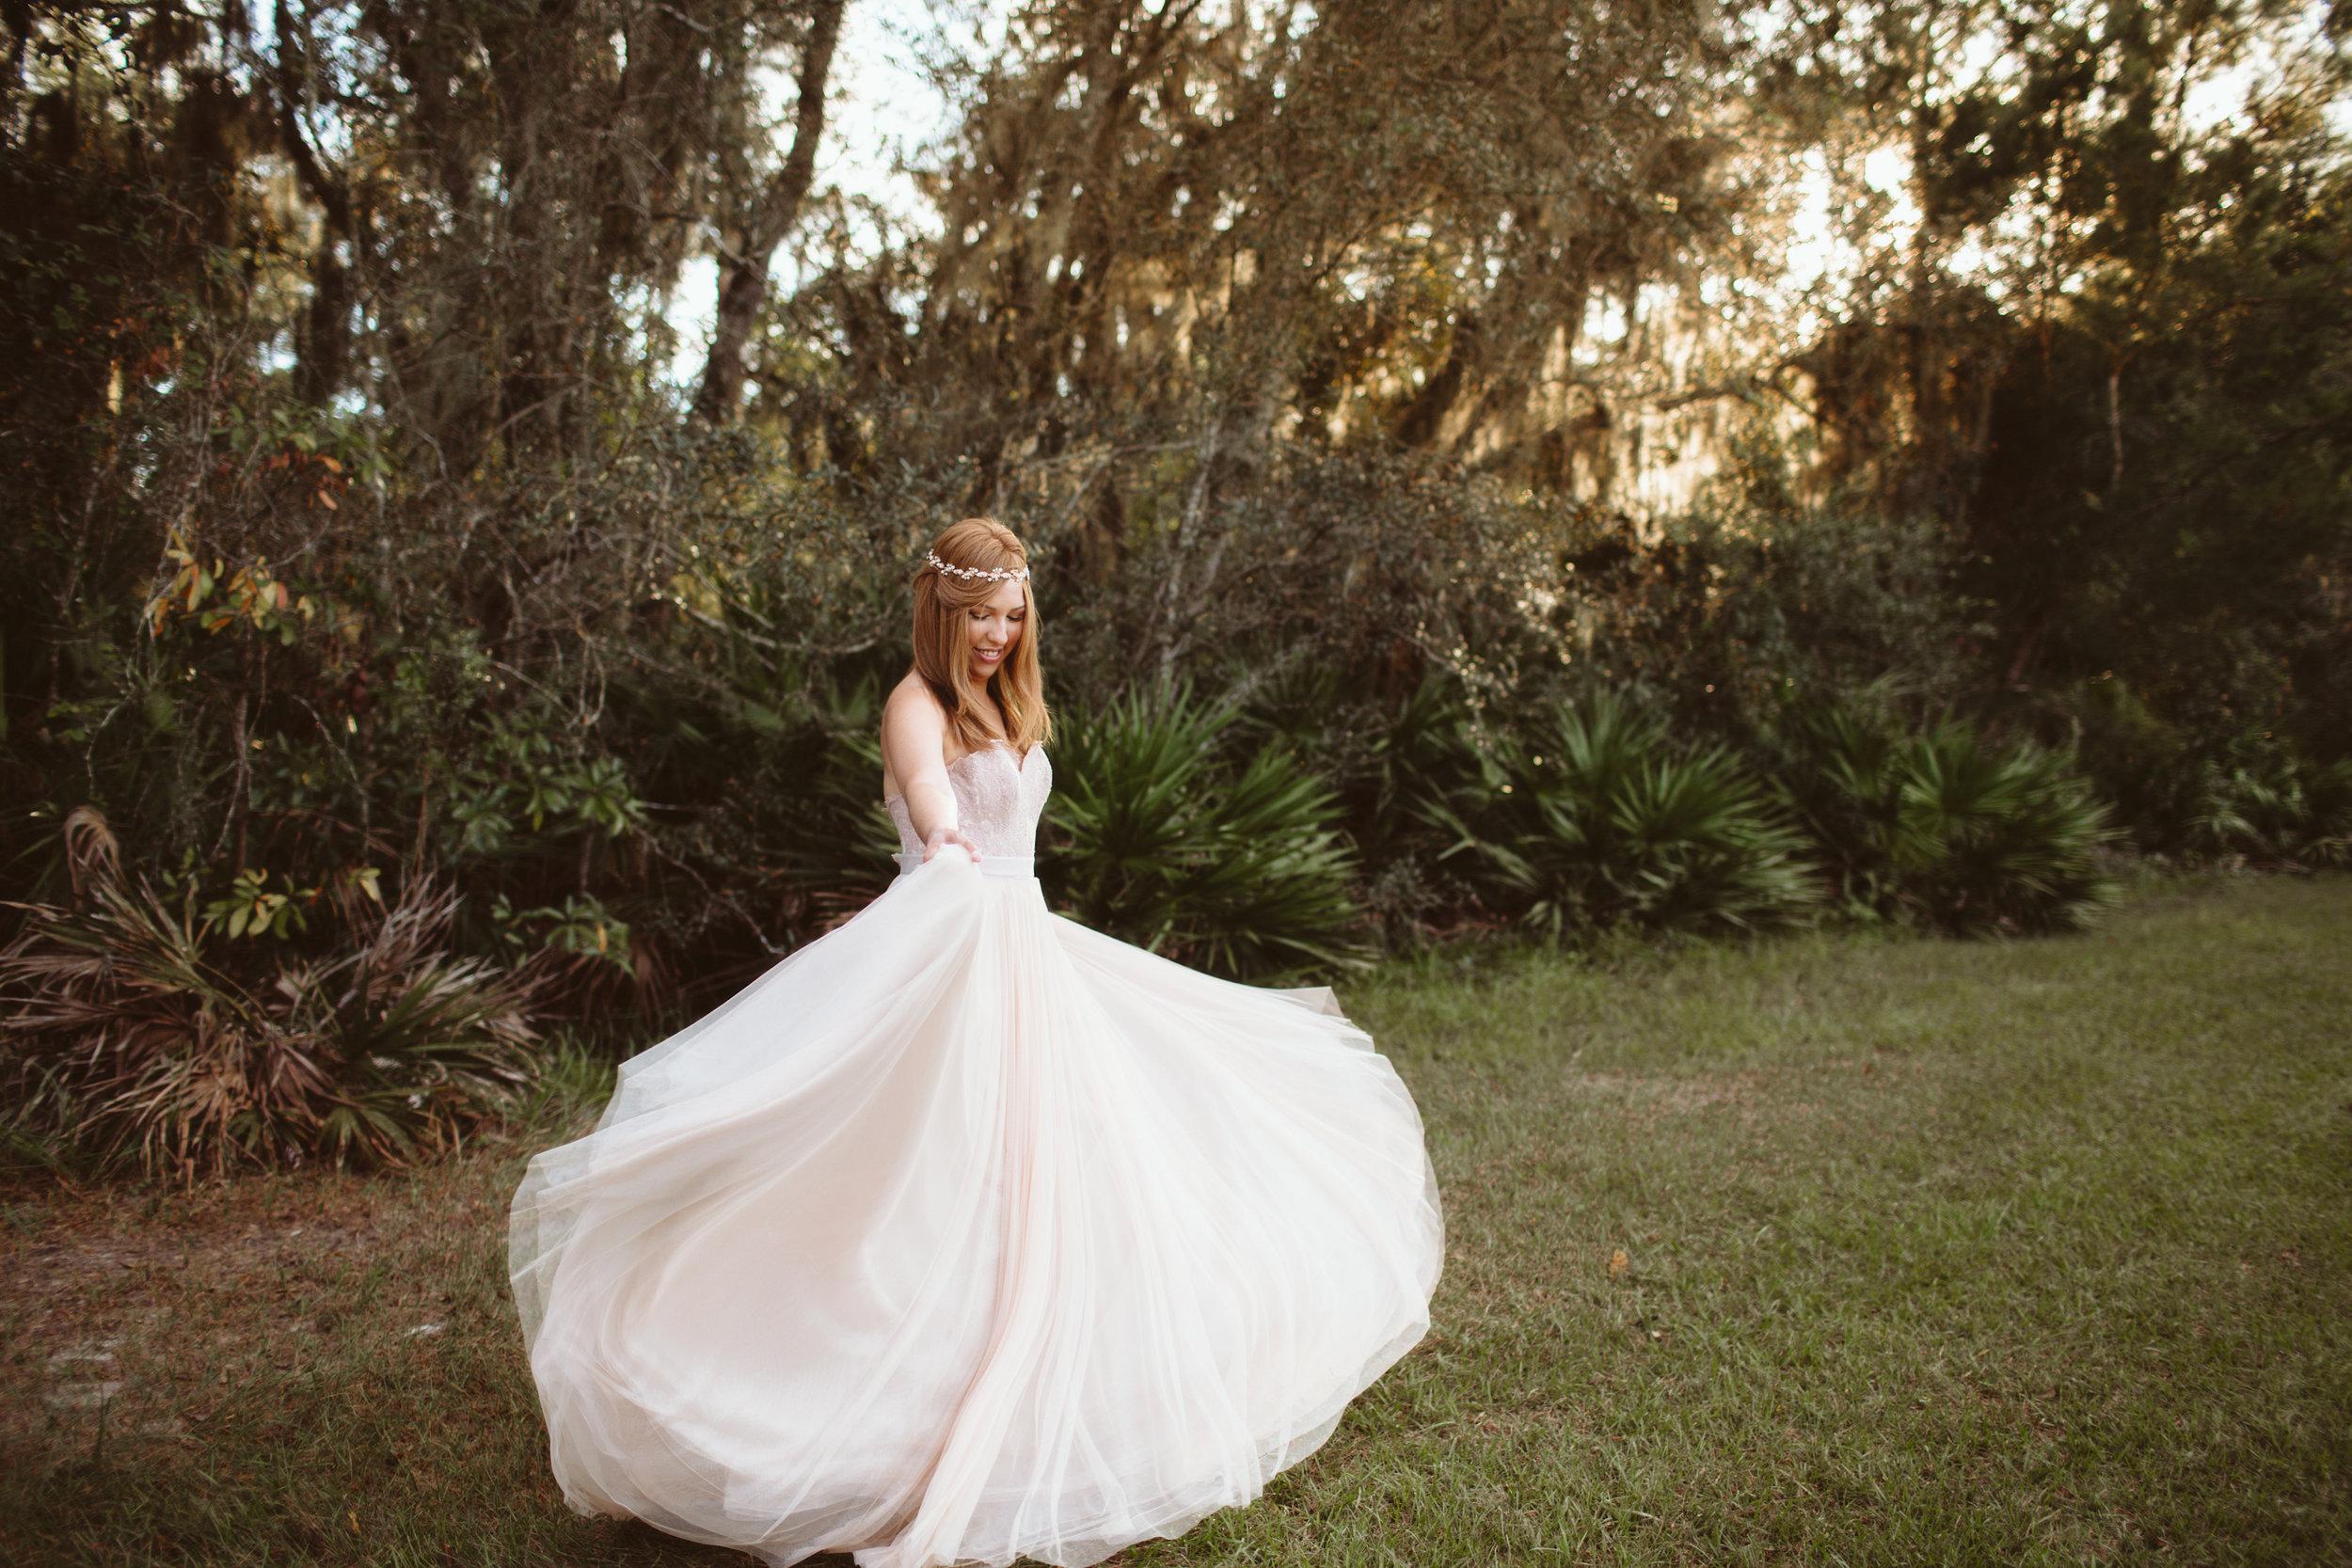 Breast Cancer awareness | Solutions bridal | Waterswoo | Vanessa Boy | vanessaboy.com |-383.com |final.jpg